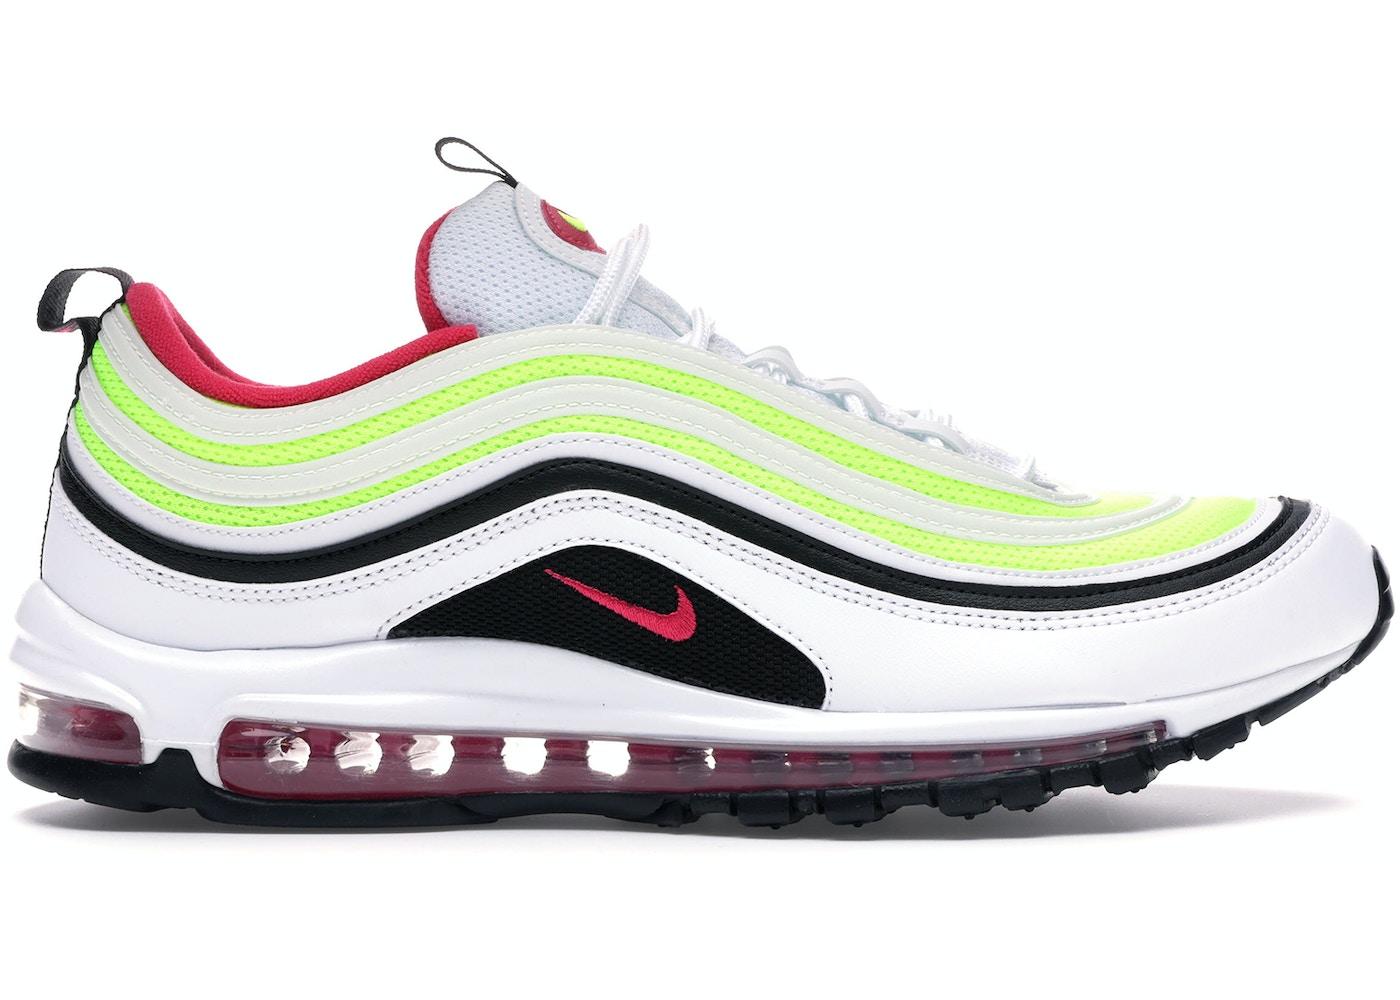 Nike Air Max 97 White Black Volt Rush Pink Ci9871 100